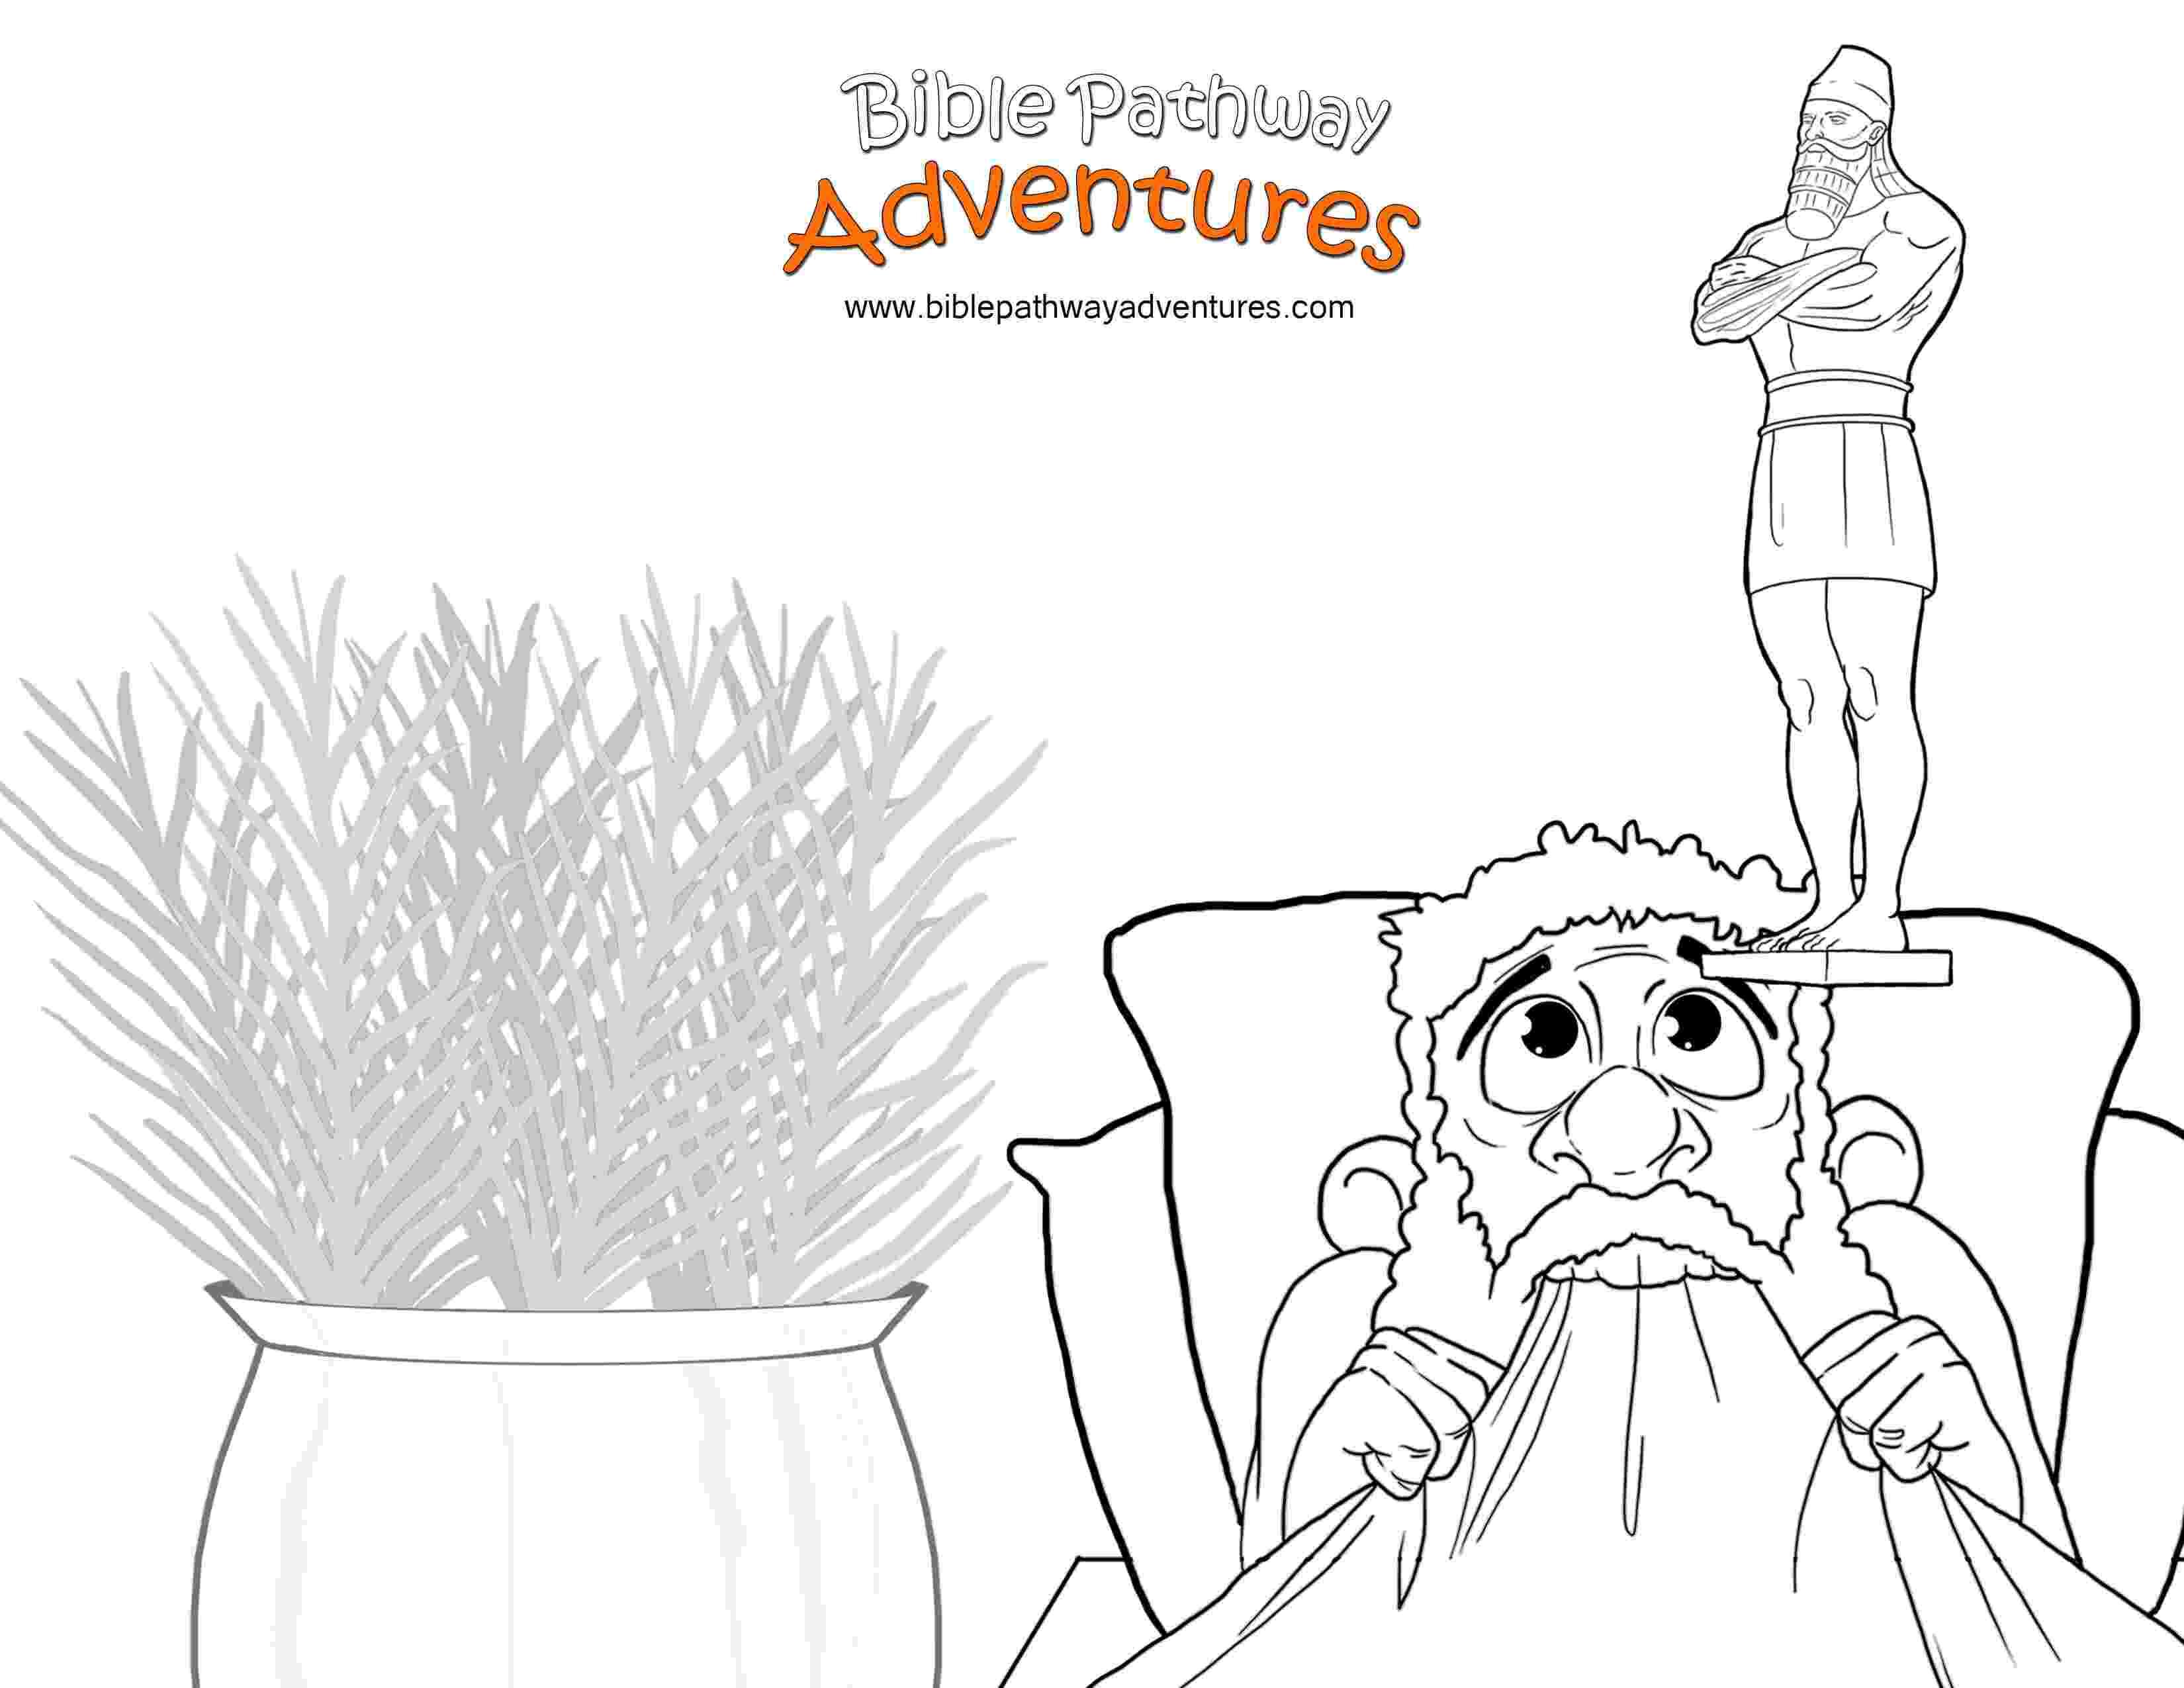 nebuchadnezzar coloring page nebuchadnezzars statue bible pathway adventures page coloring nebuchadnezzar